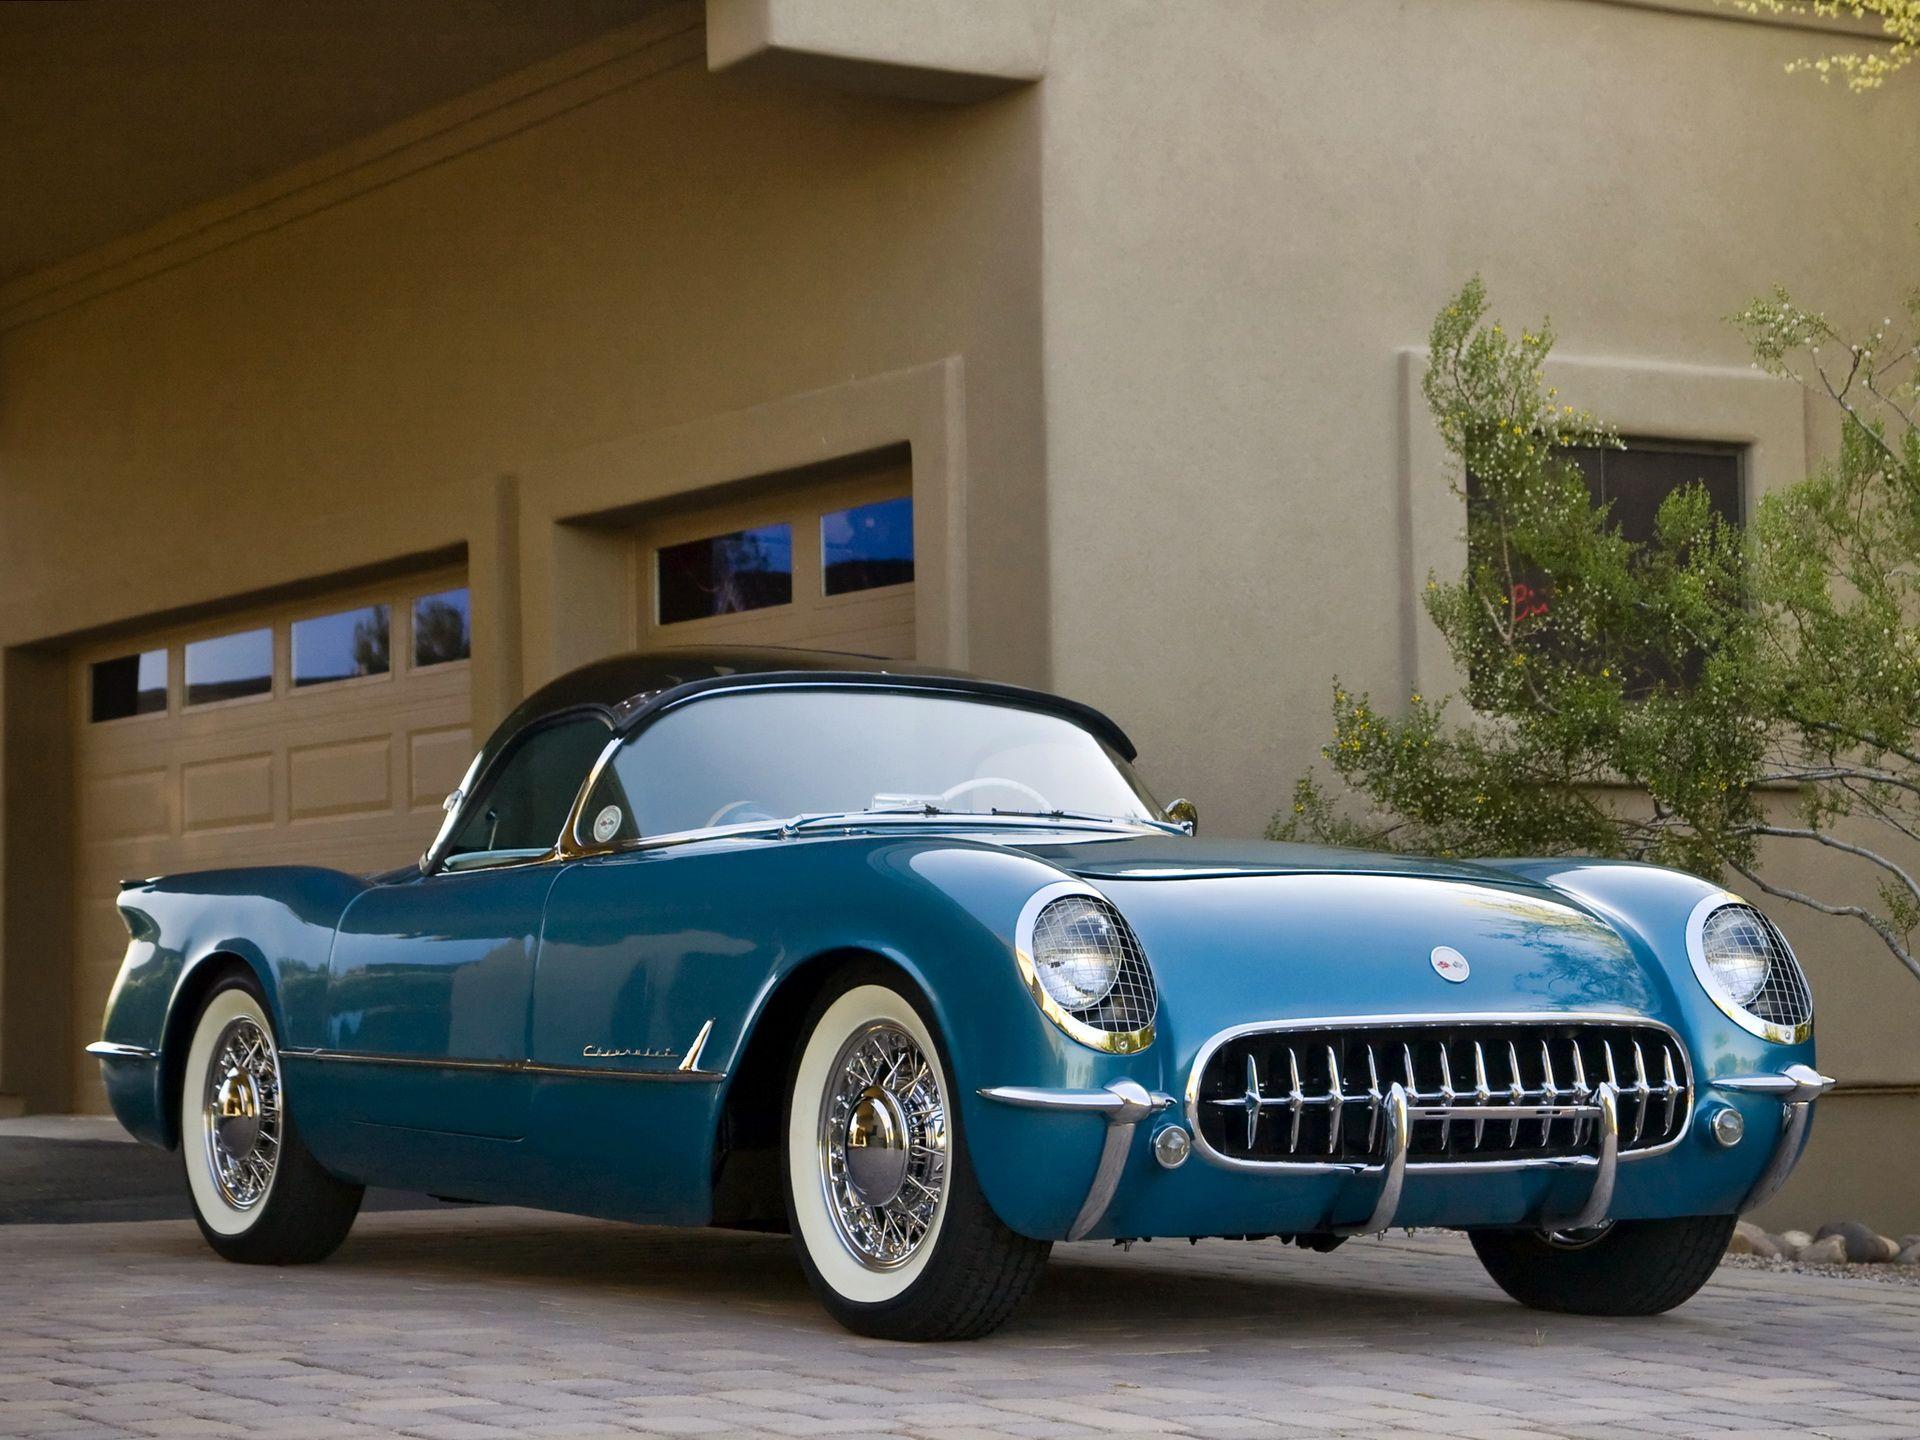 1954 Chevrolet Corvette vehicles cars chevy retro old classic ...